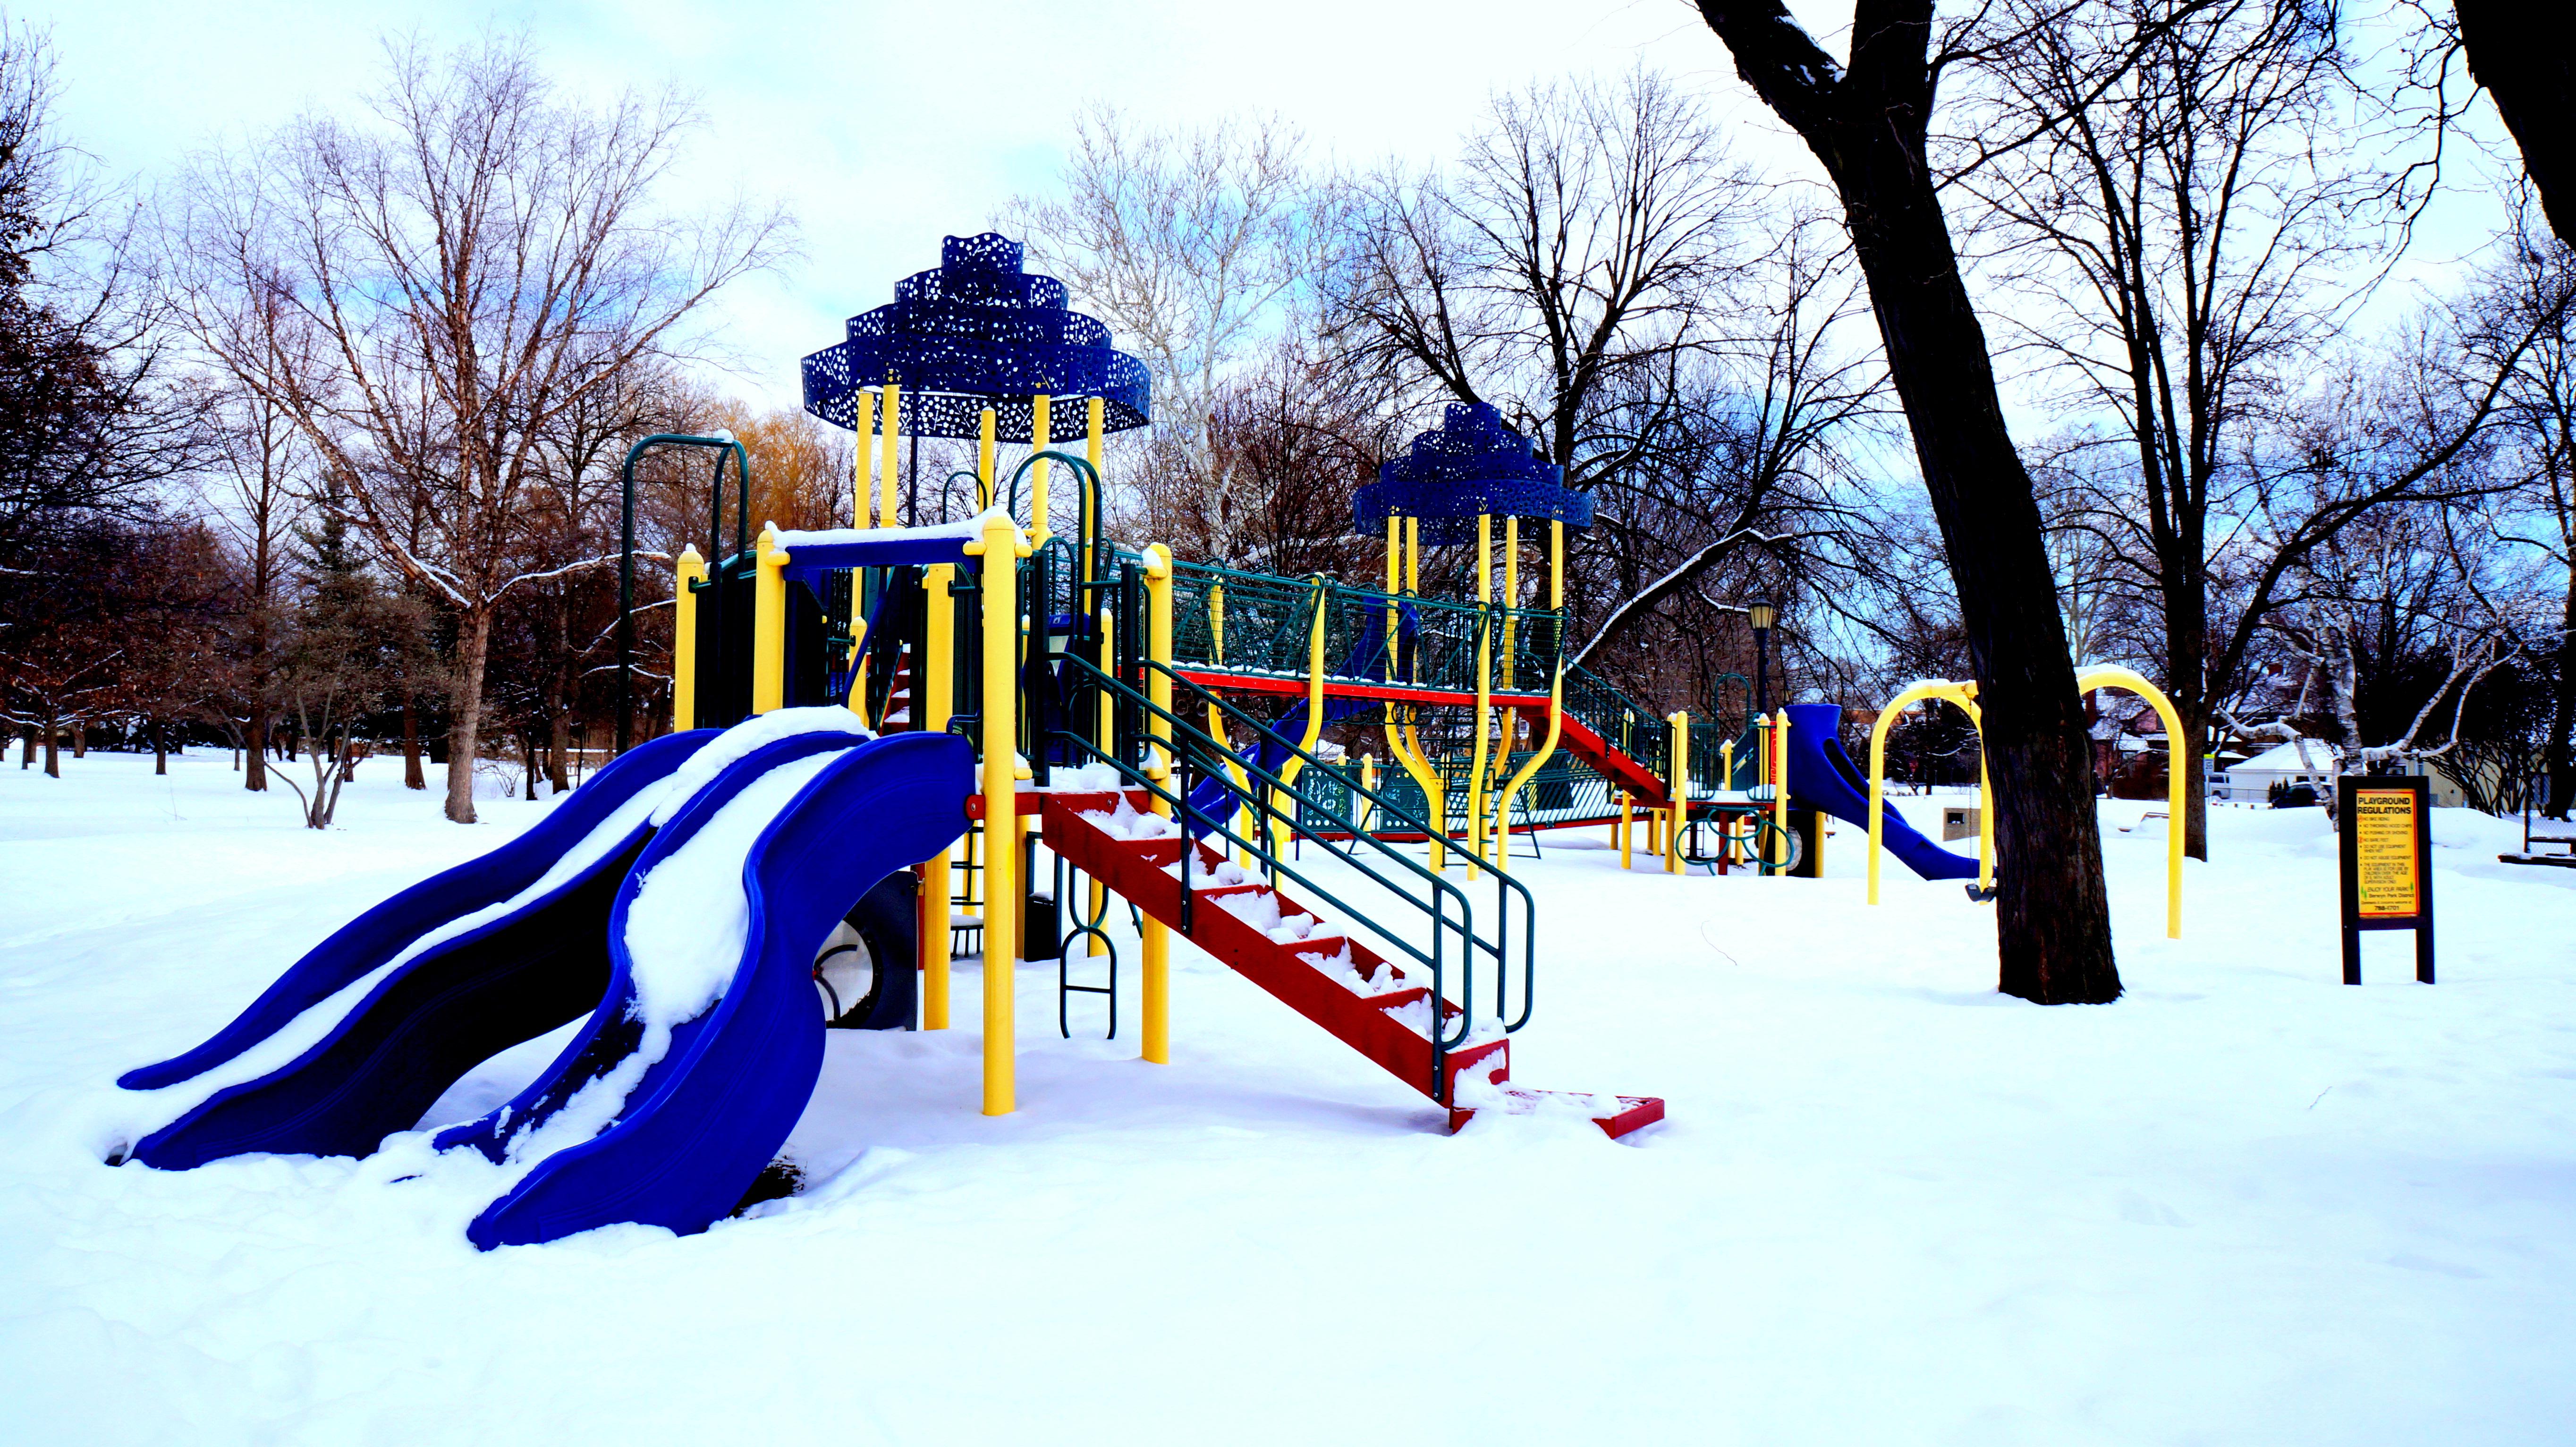 File proksa park playground jpg wikimedia commons for Winter gardens elementary school